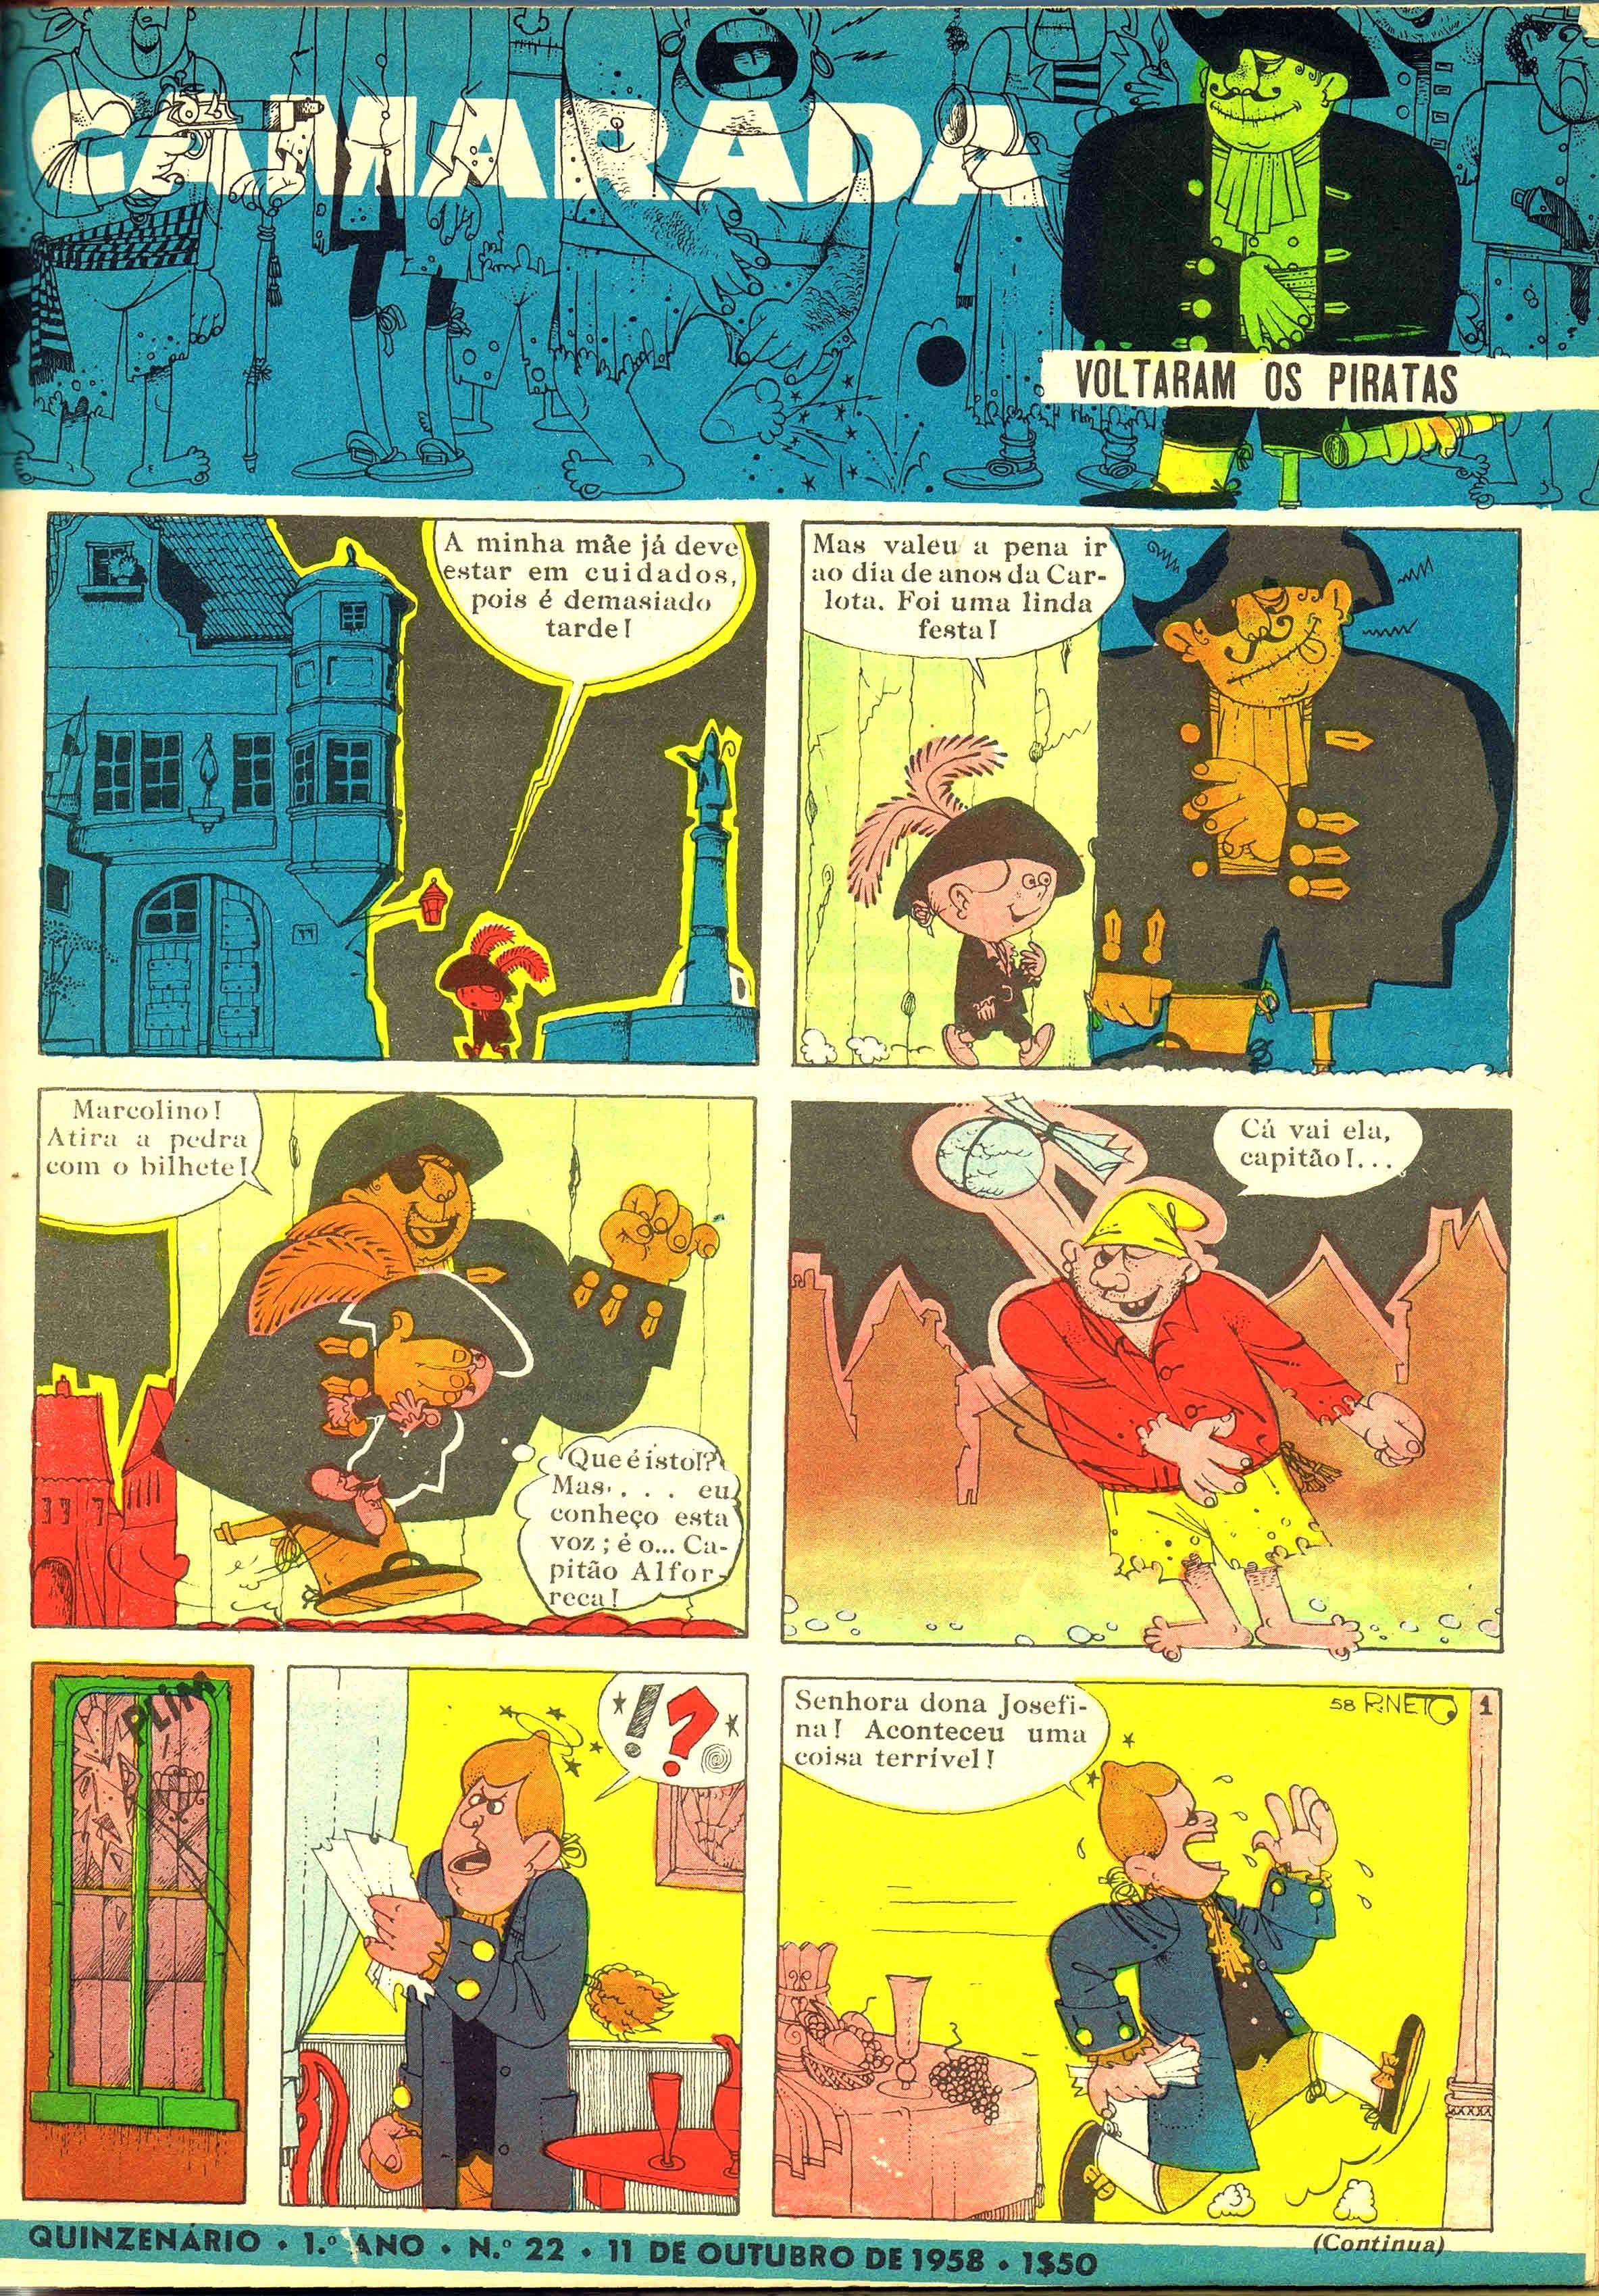 camarada mocidade portuguesa nº 22 1958